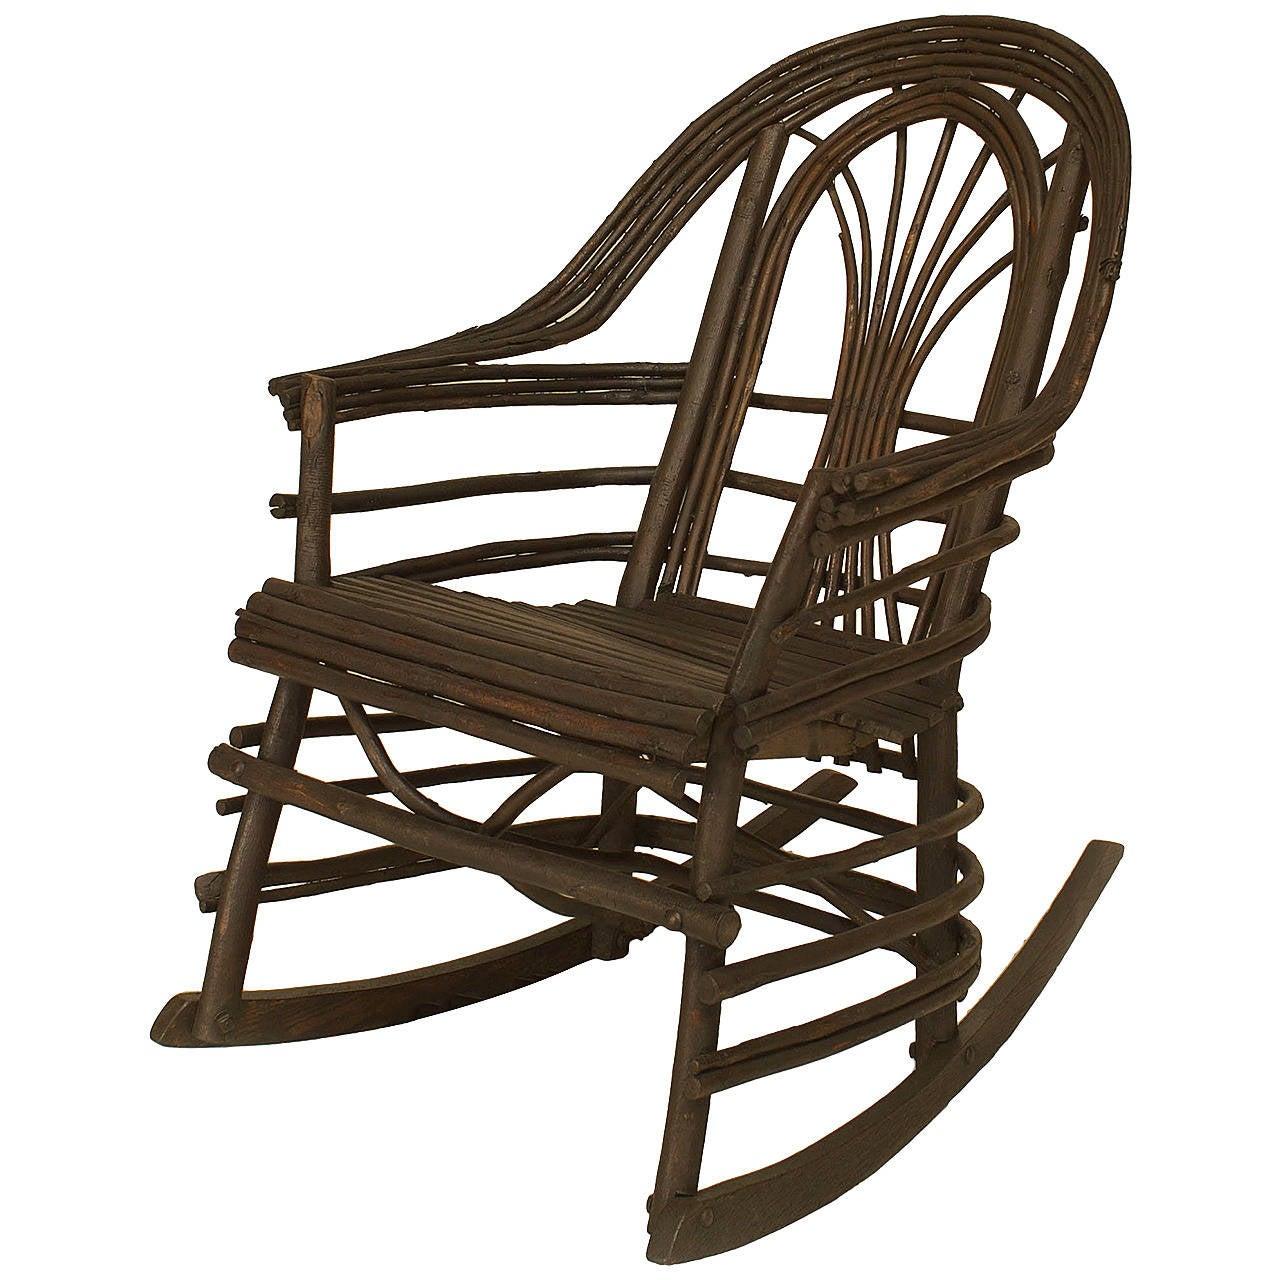 20th c american adirondack style willow twig rocking - Adirondack style bedroom furniture ...